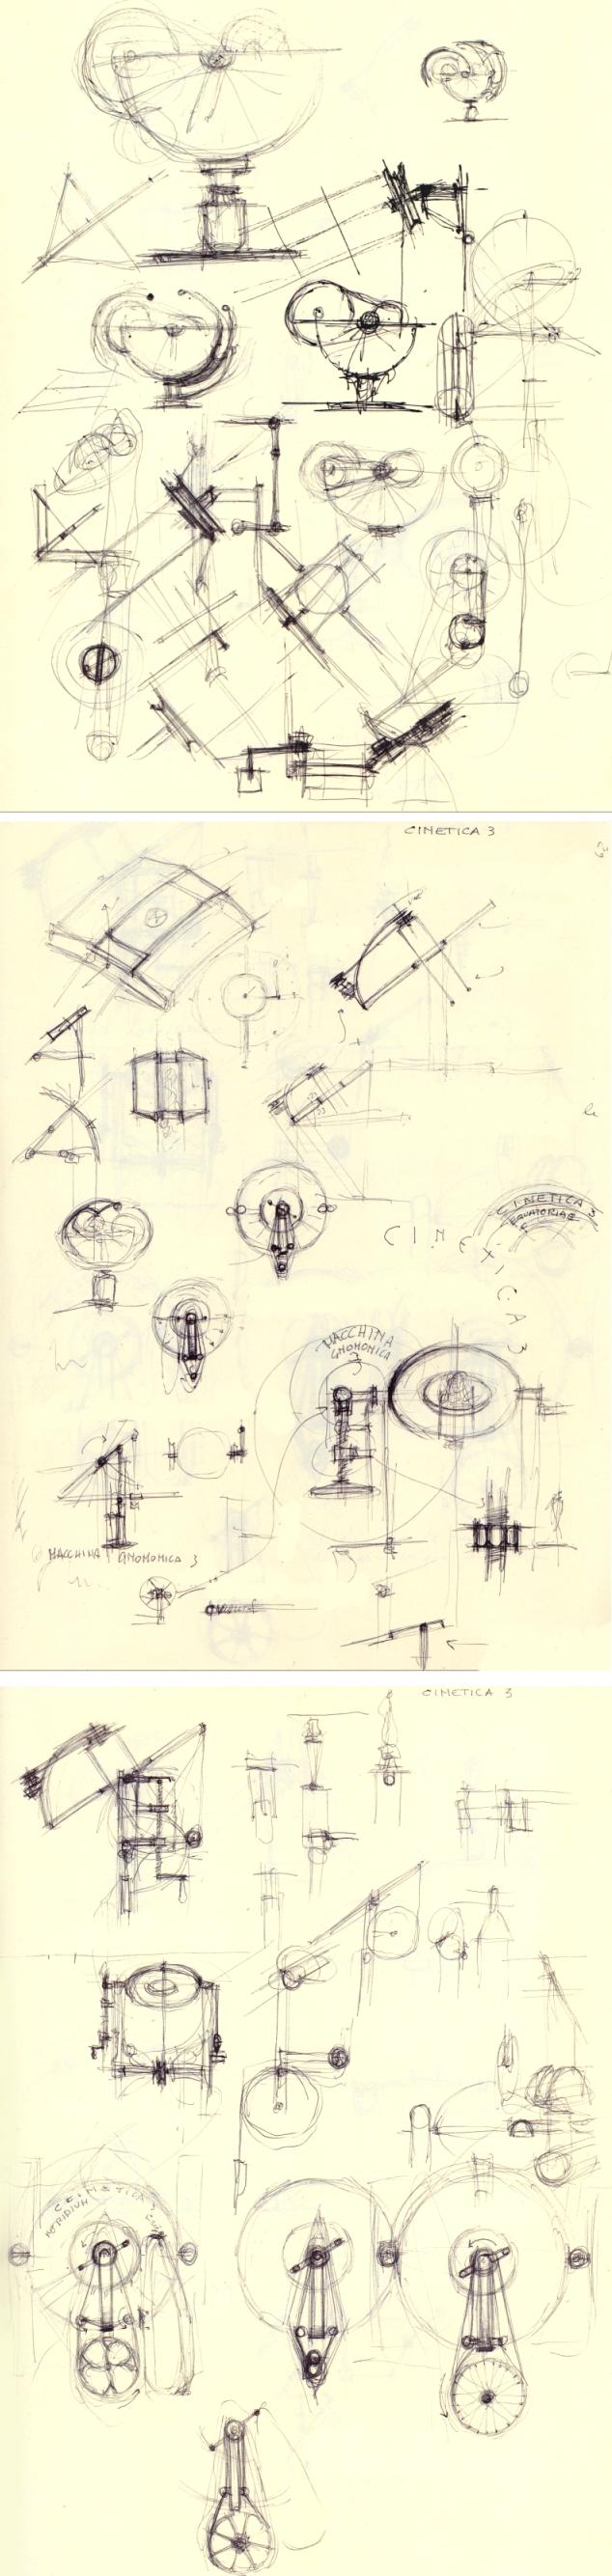 Disegni Macchine Gnomoniche Ferlenga